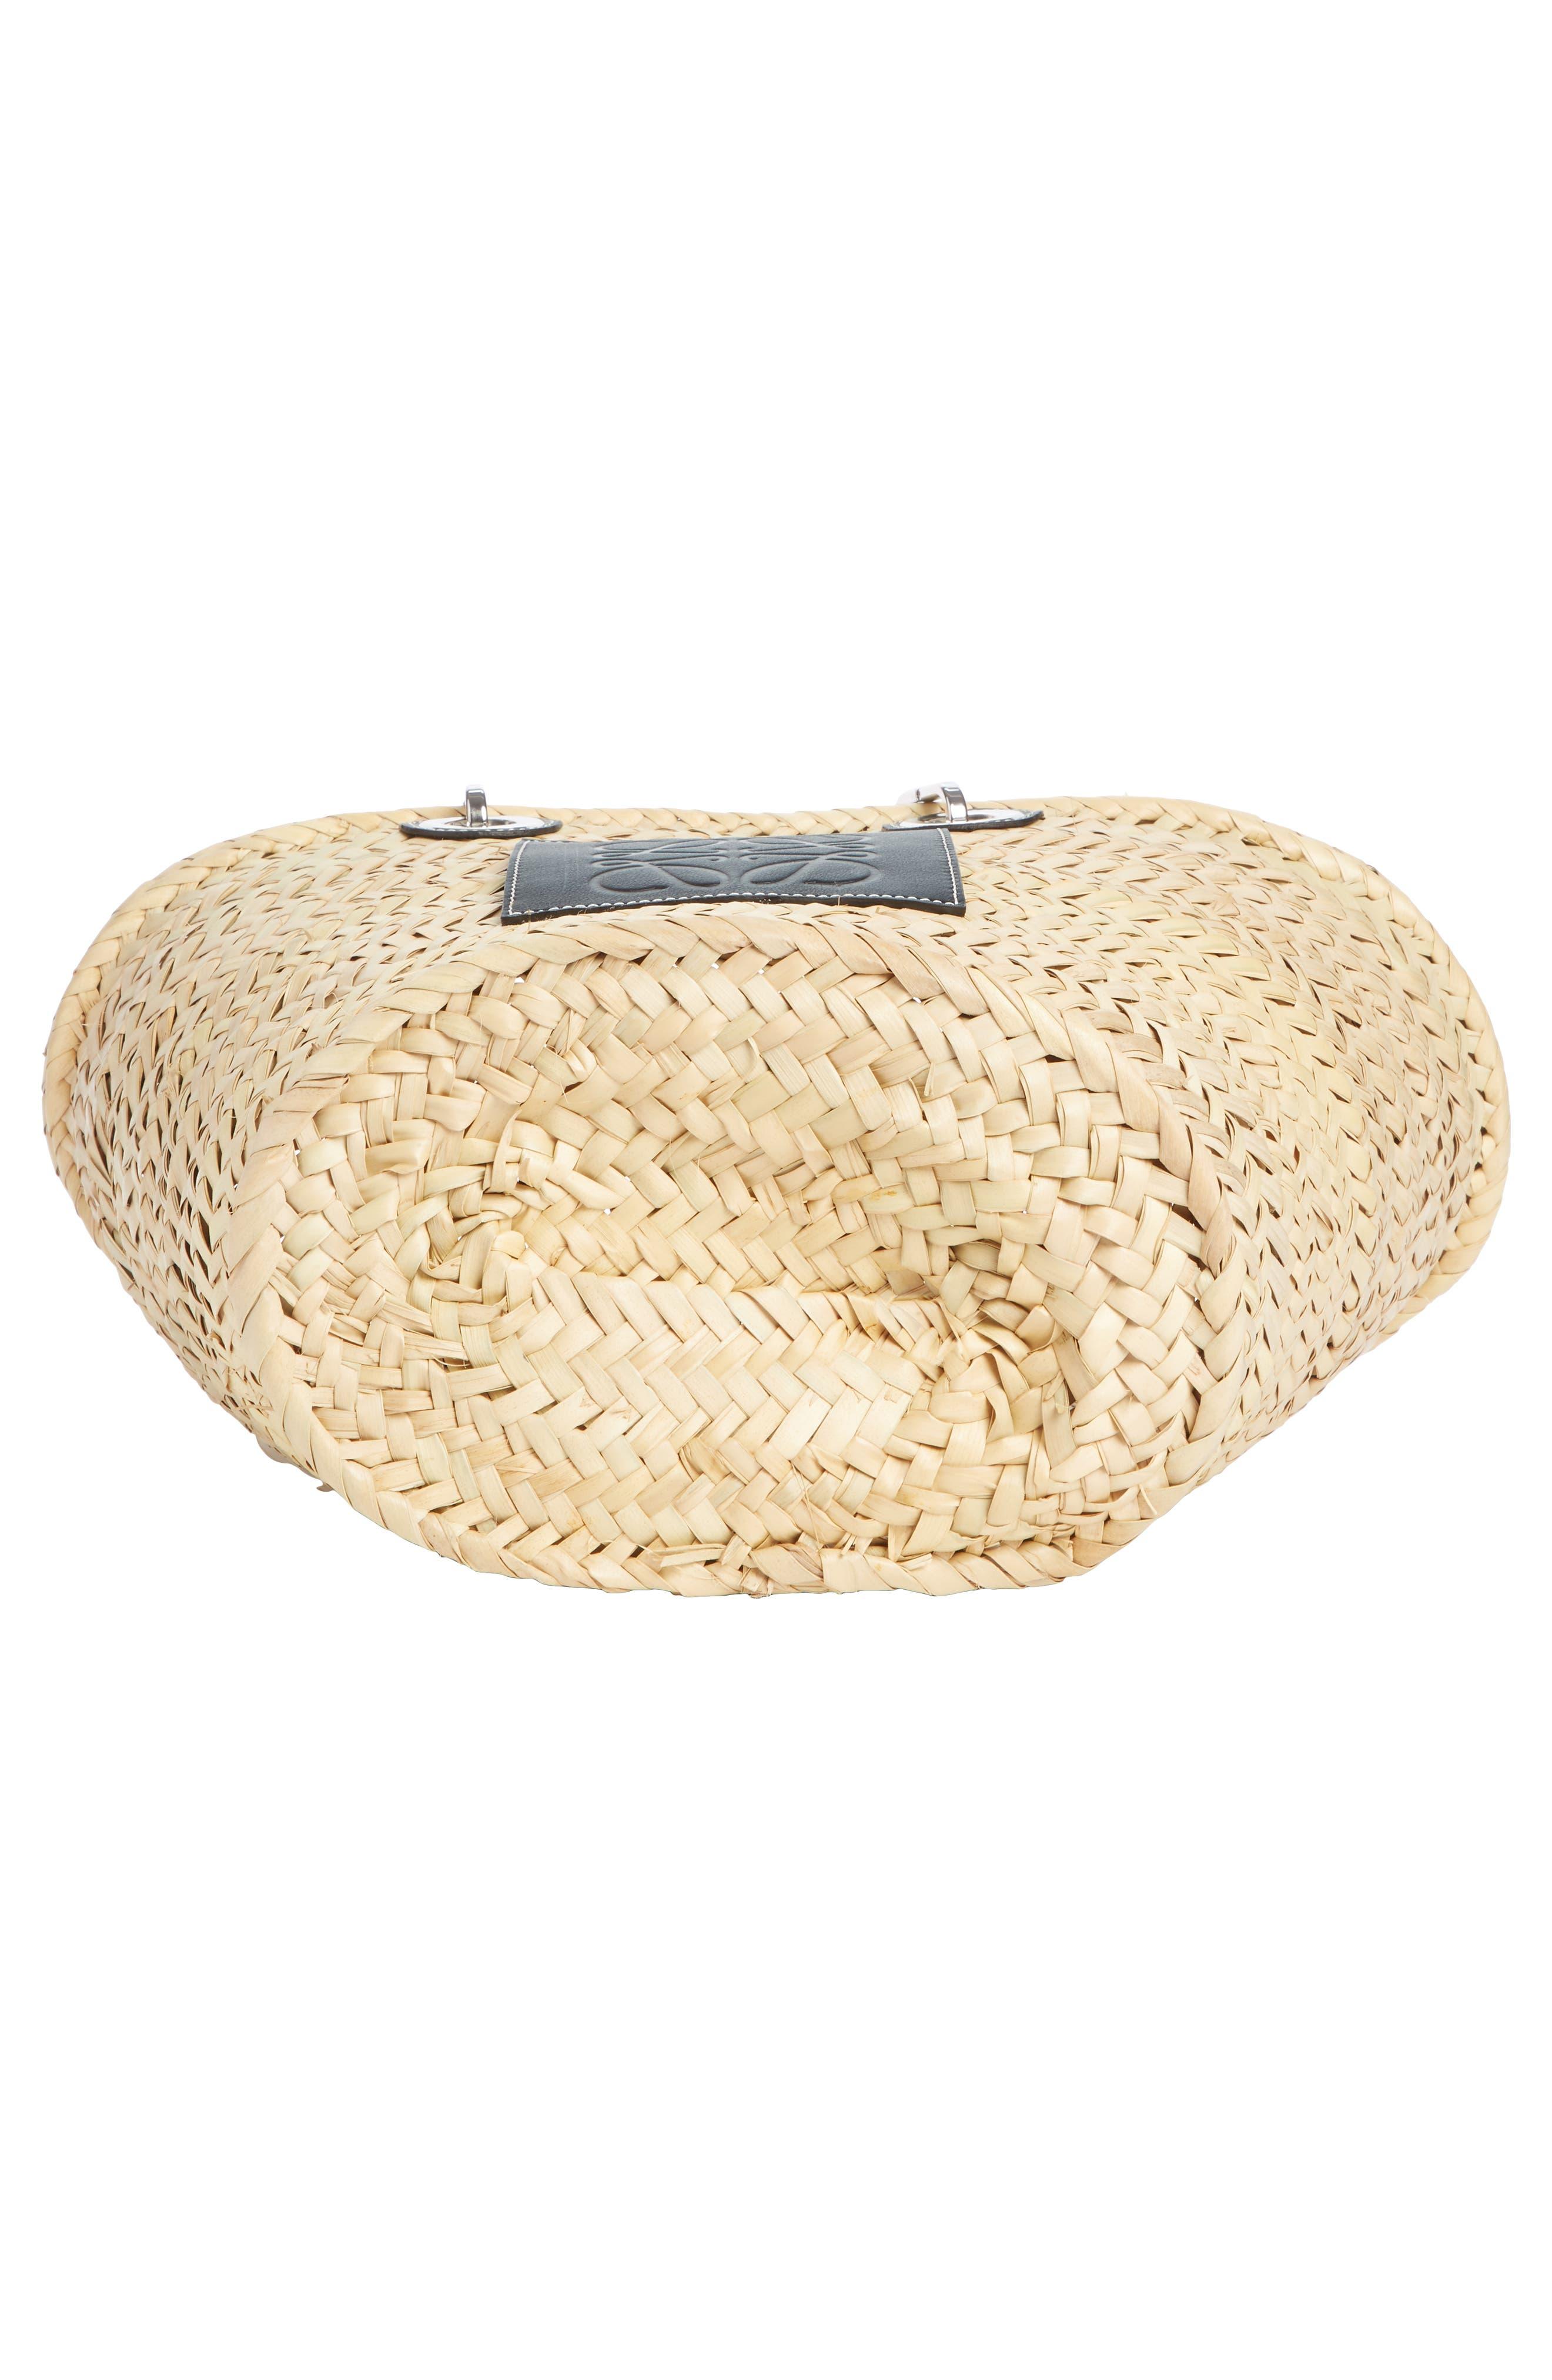 LOEWE, Chain Handle Woven Palm Market Basket, Alternate thumbnail 5, color, NATURAL/ BLACK